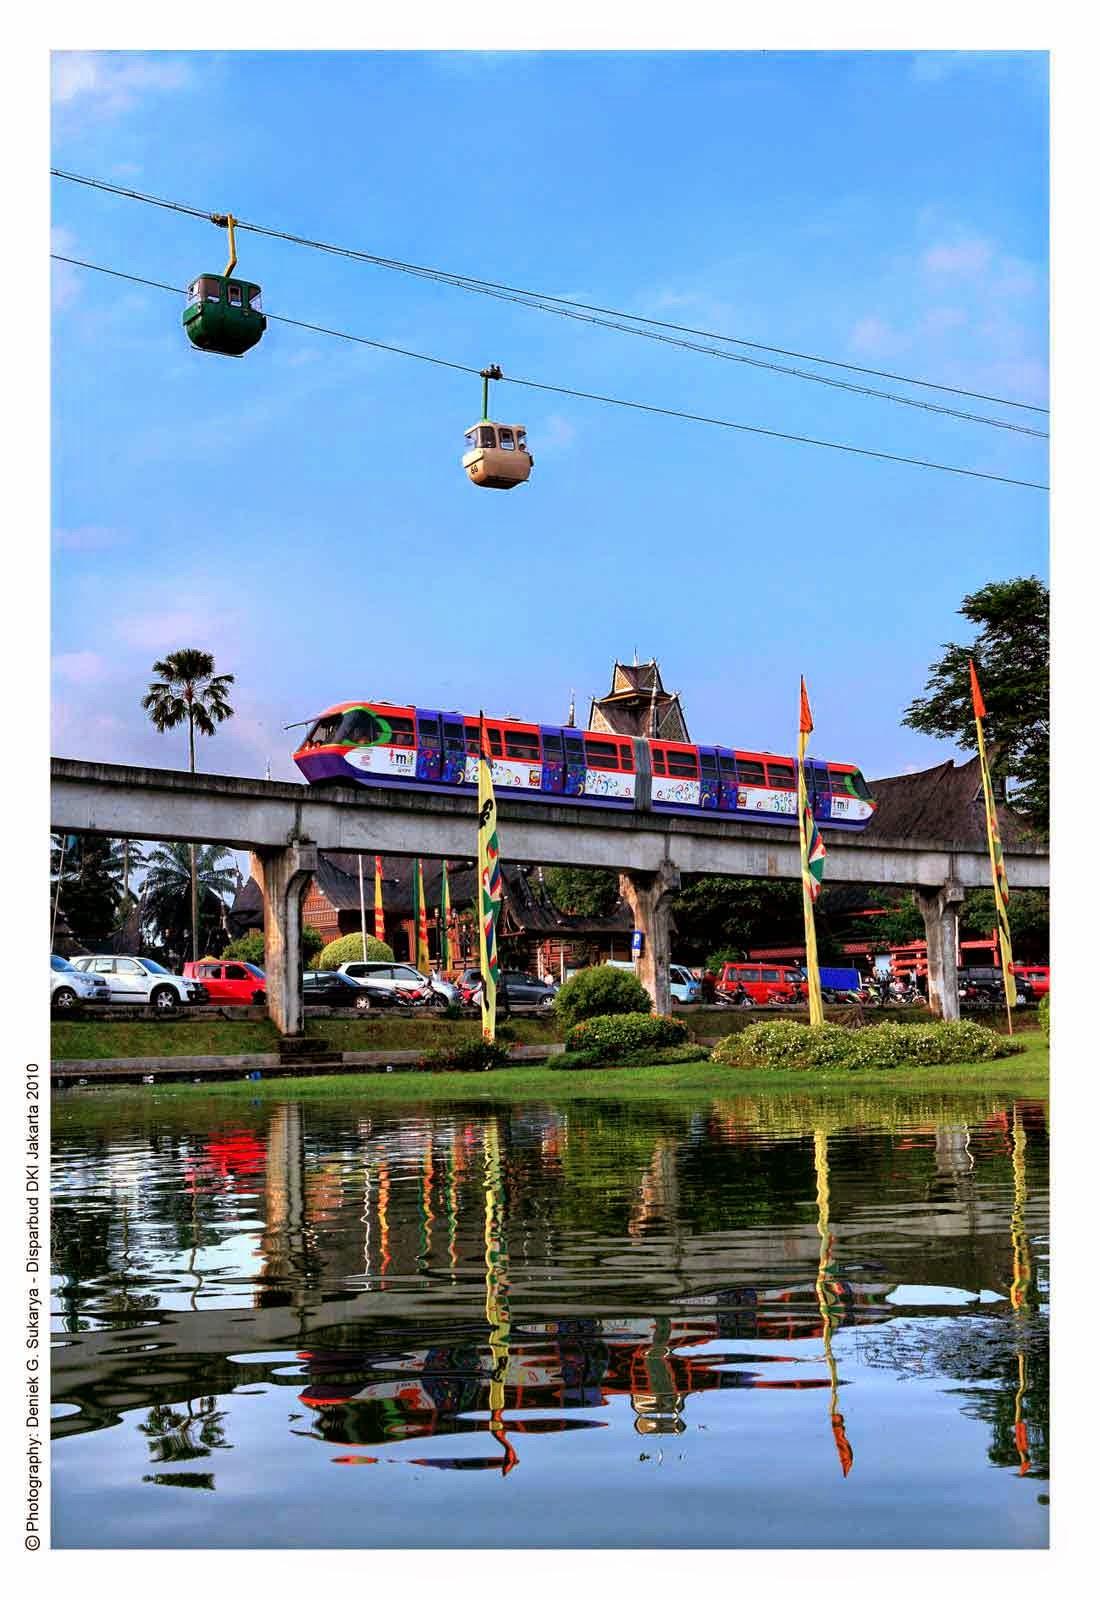 Wahana Sky Trains and Cable Cars Taman Mini Indonesia Indah (TMII), Jakarta